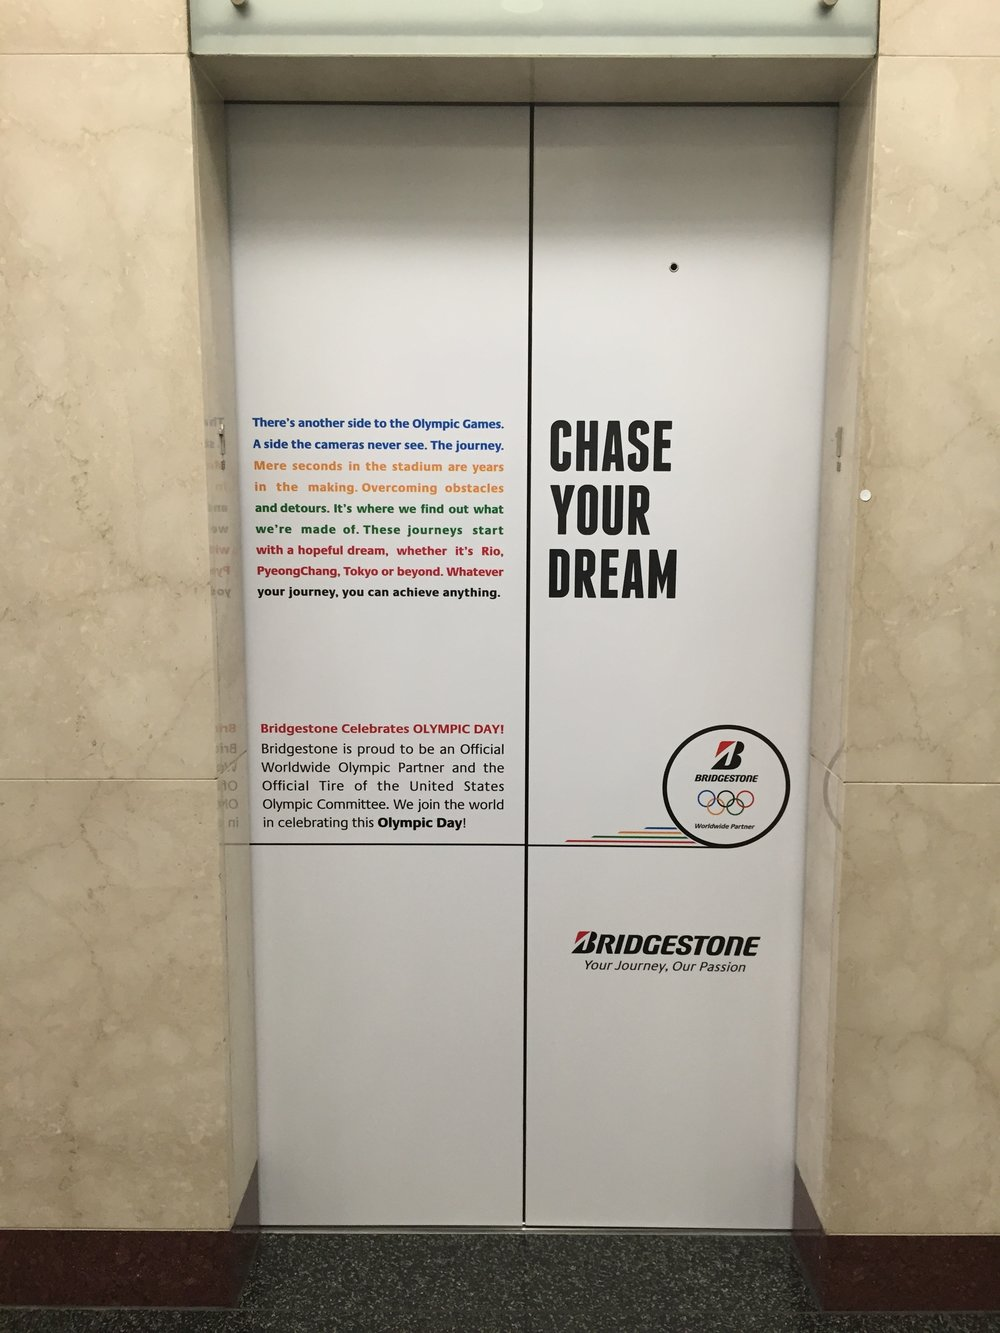 Elevator Wraps installed in Bridgestone's Headquarters for 2016 Olympics